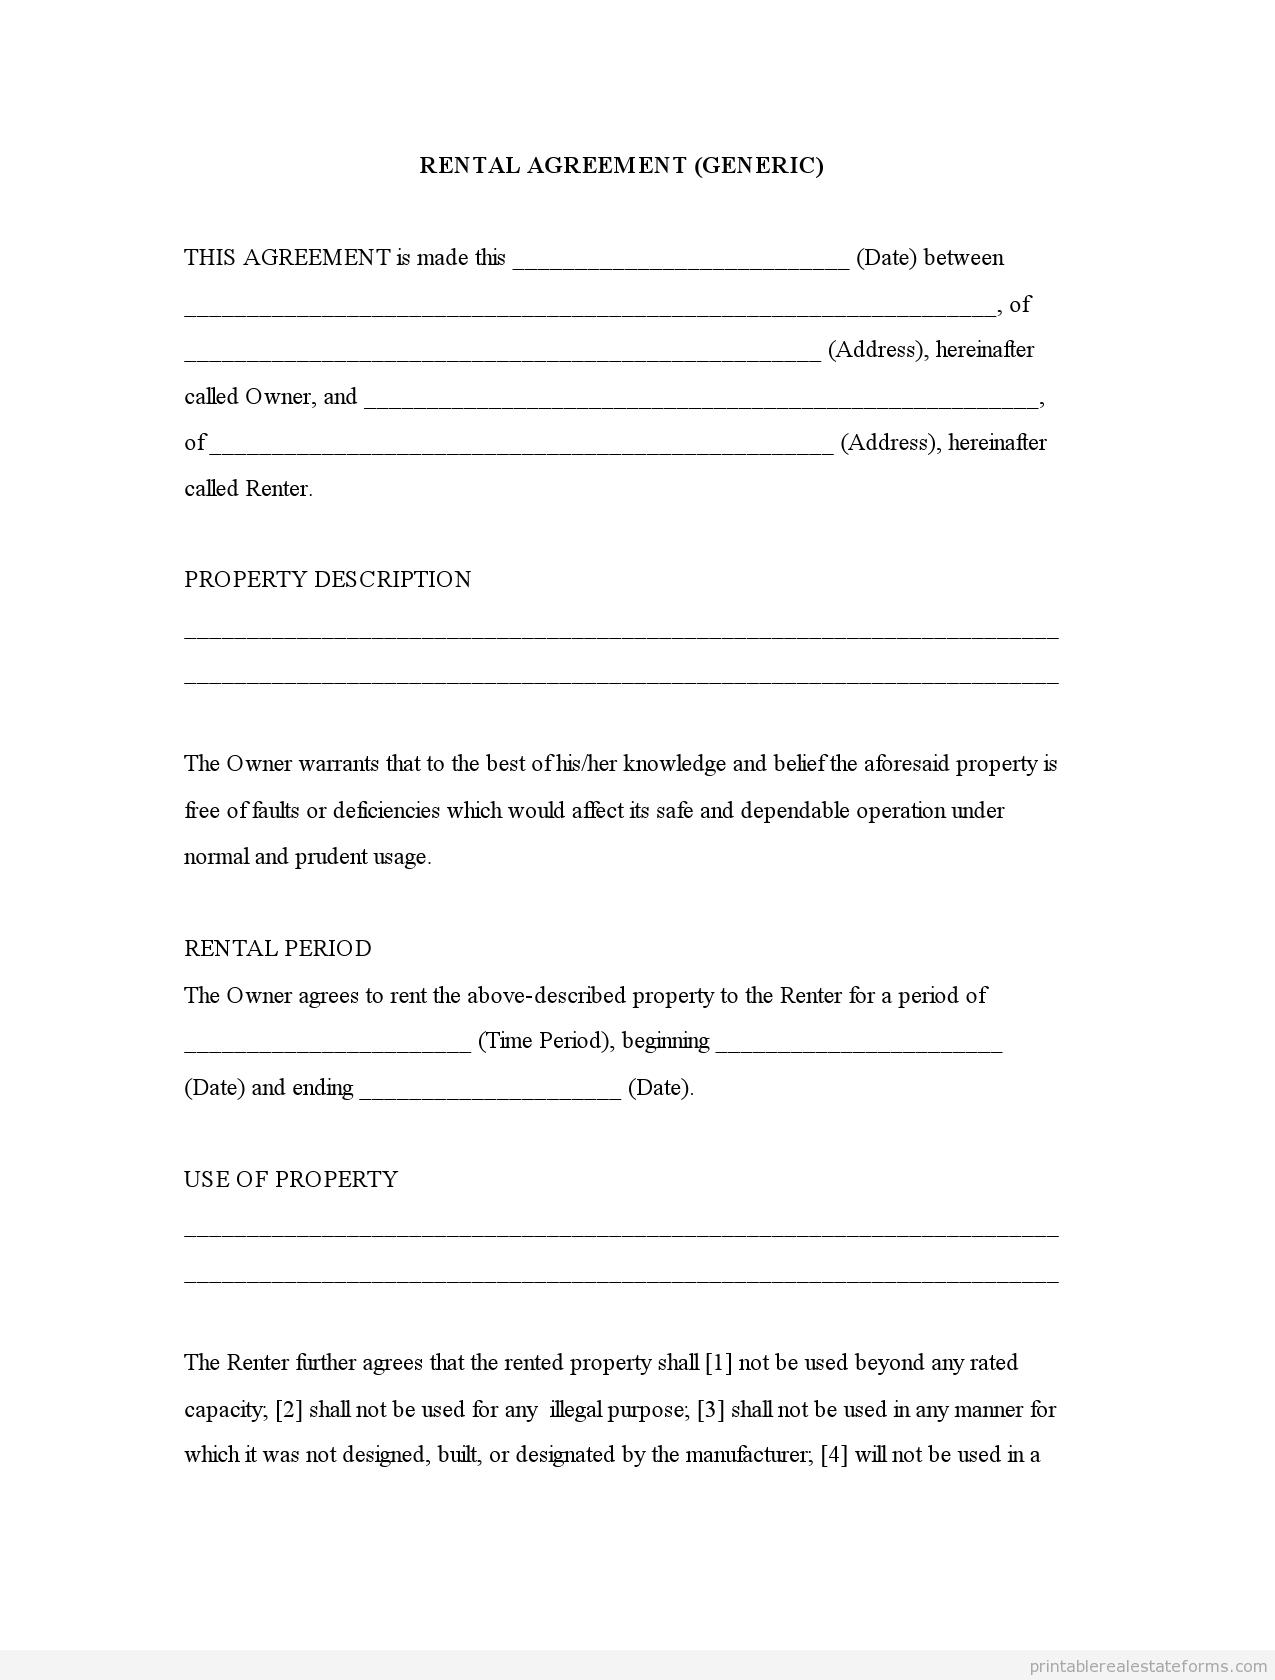 Free Printable Rental Agreement | Rental Agreement (Generic)0001 - Free Printable Lease Agreement Ny